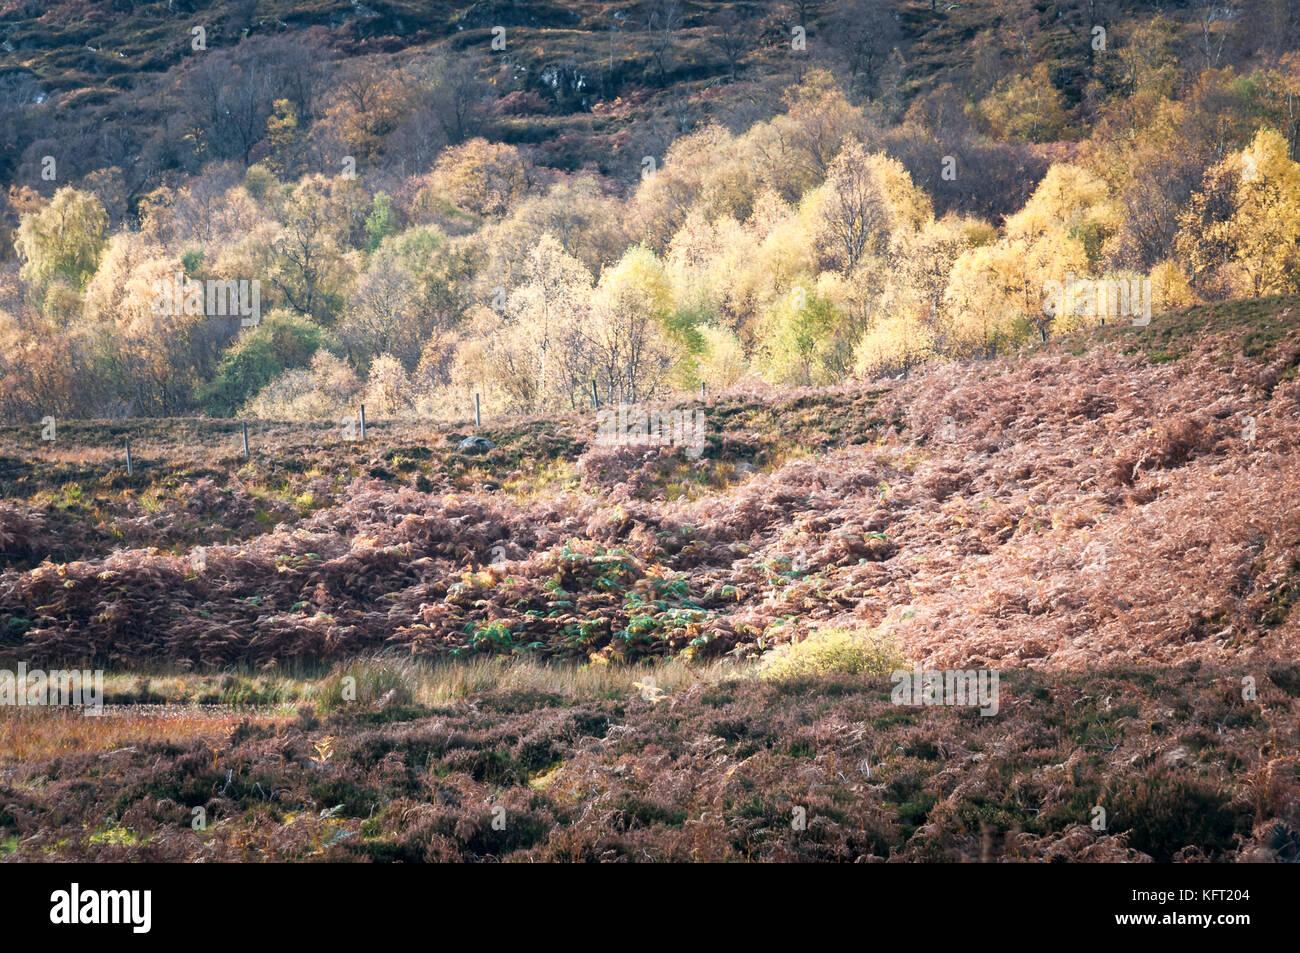 A landscape image of autumnal Silver Birch, Betula pendula, trees, Highlands, Scotland, UK, October 2017 - Stock Image